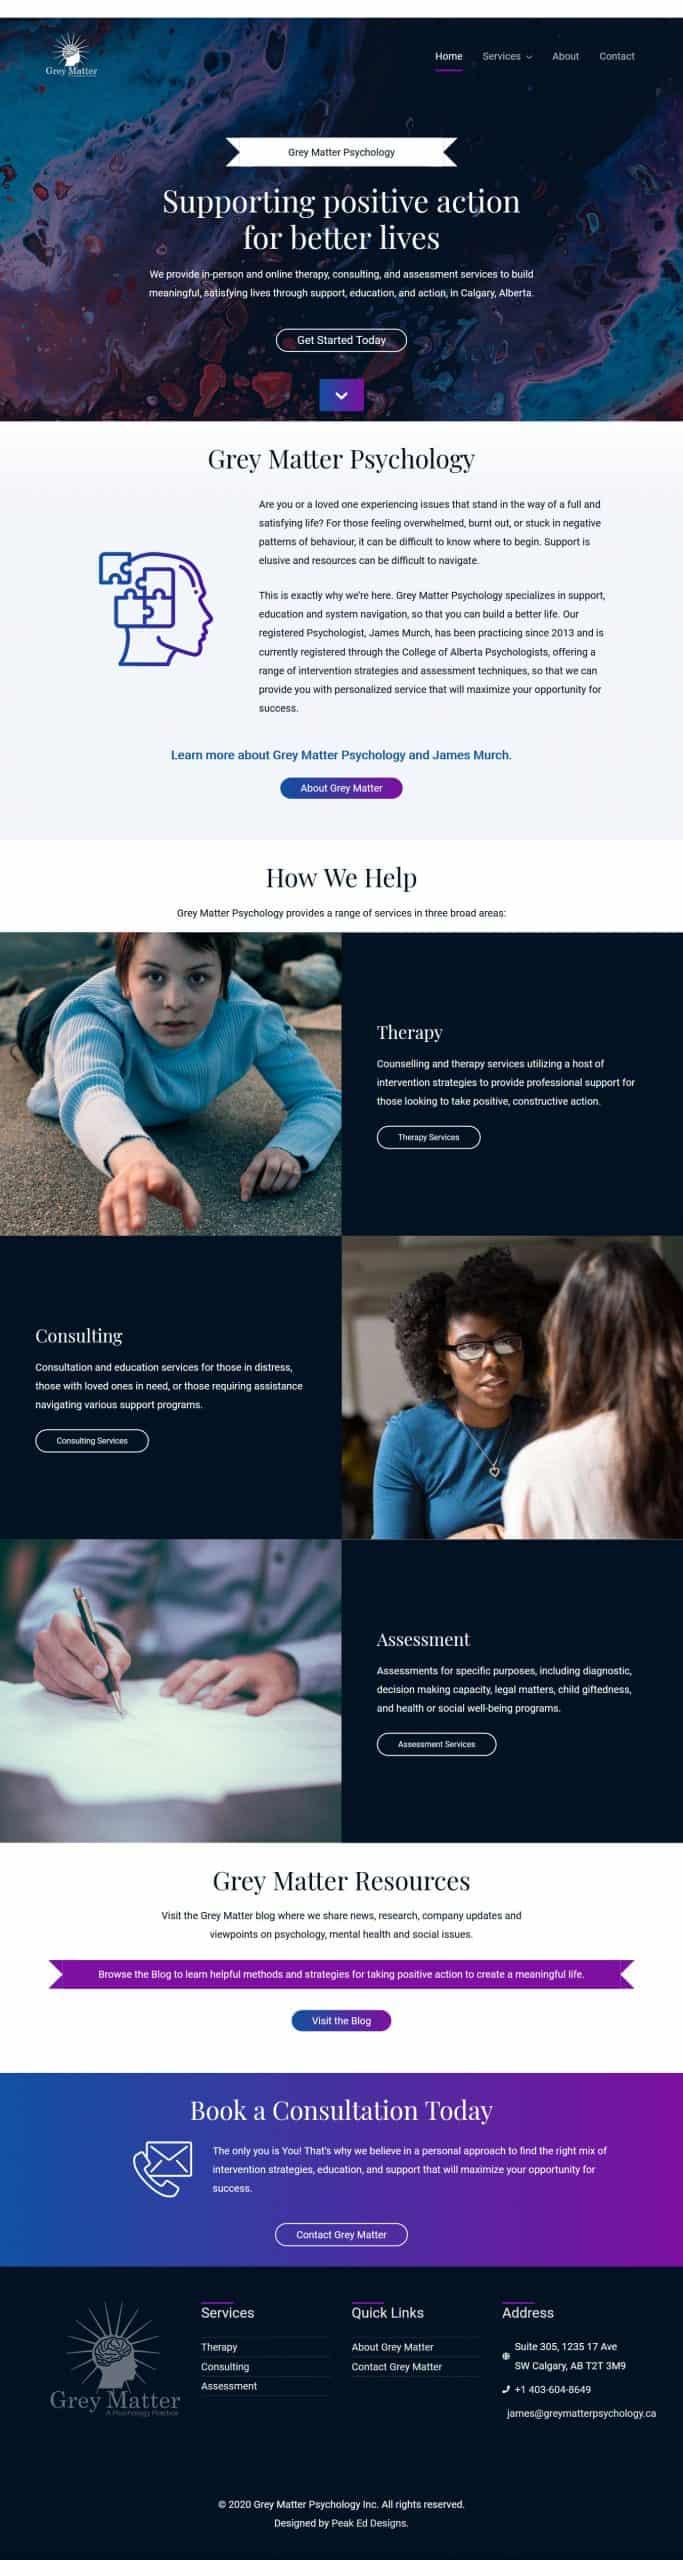 Grey Matter Psychology.ca Home page | Peak Ed Designs